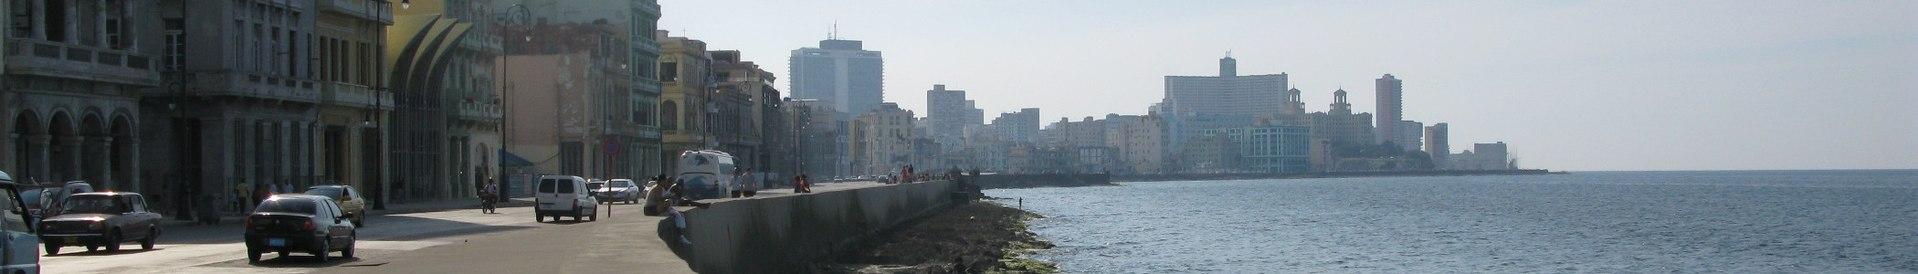 Malecon (Cuba) banner Foreshore.jpg